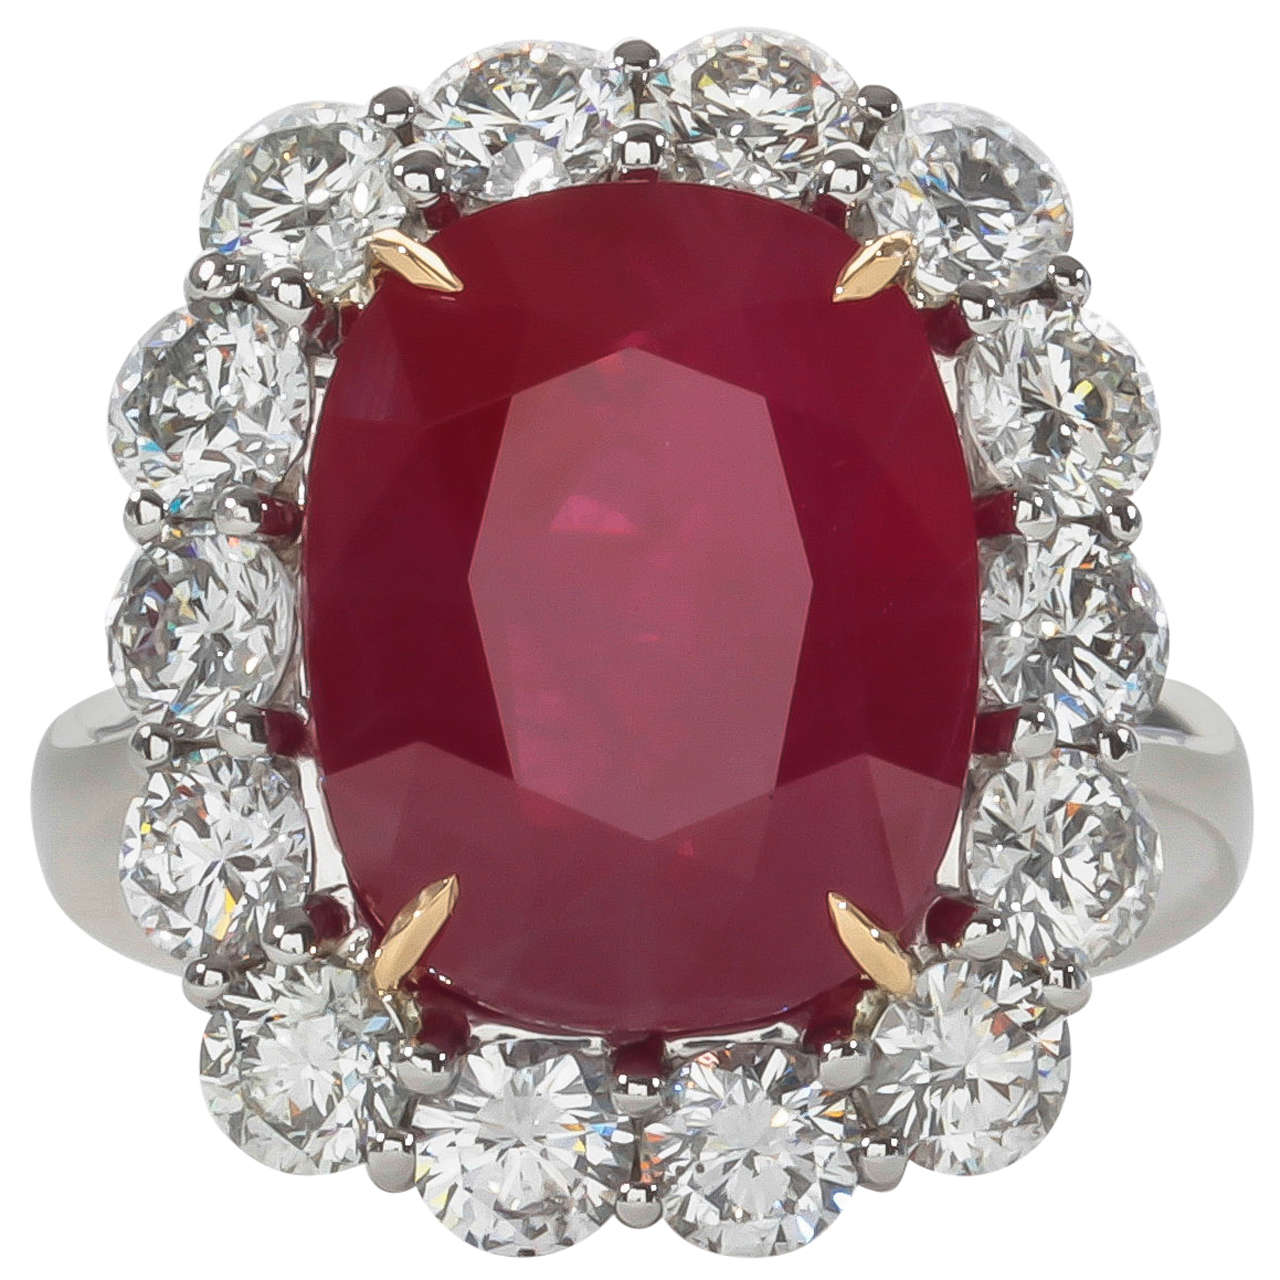 Rare 10 Carat Burma Ruby Diamond Ring White Gold Rings Ruby Diamond Rings Diamond